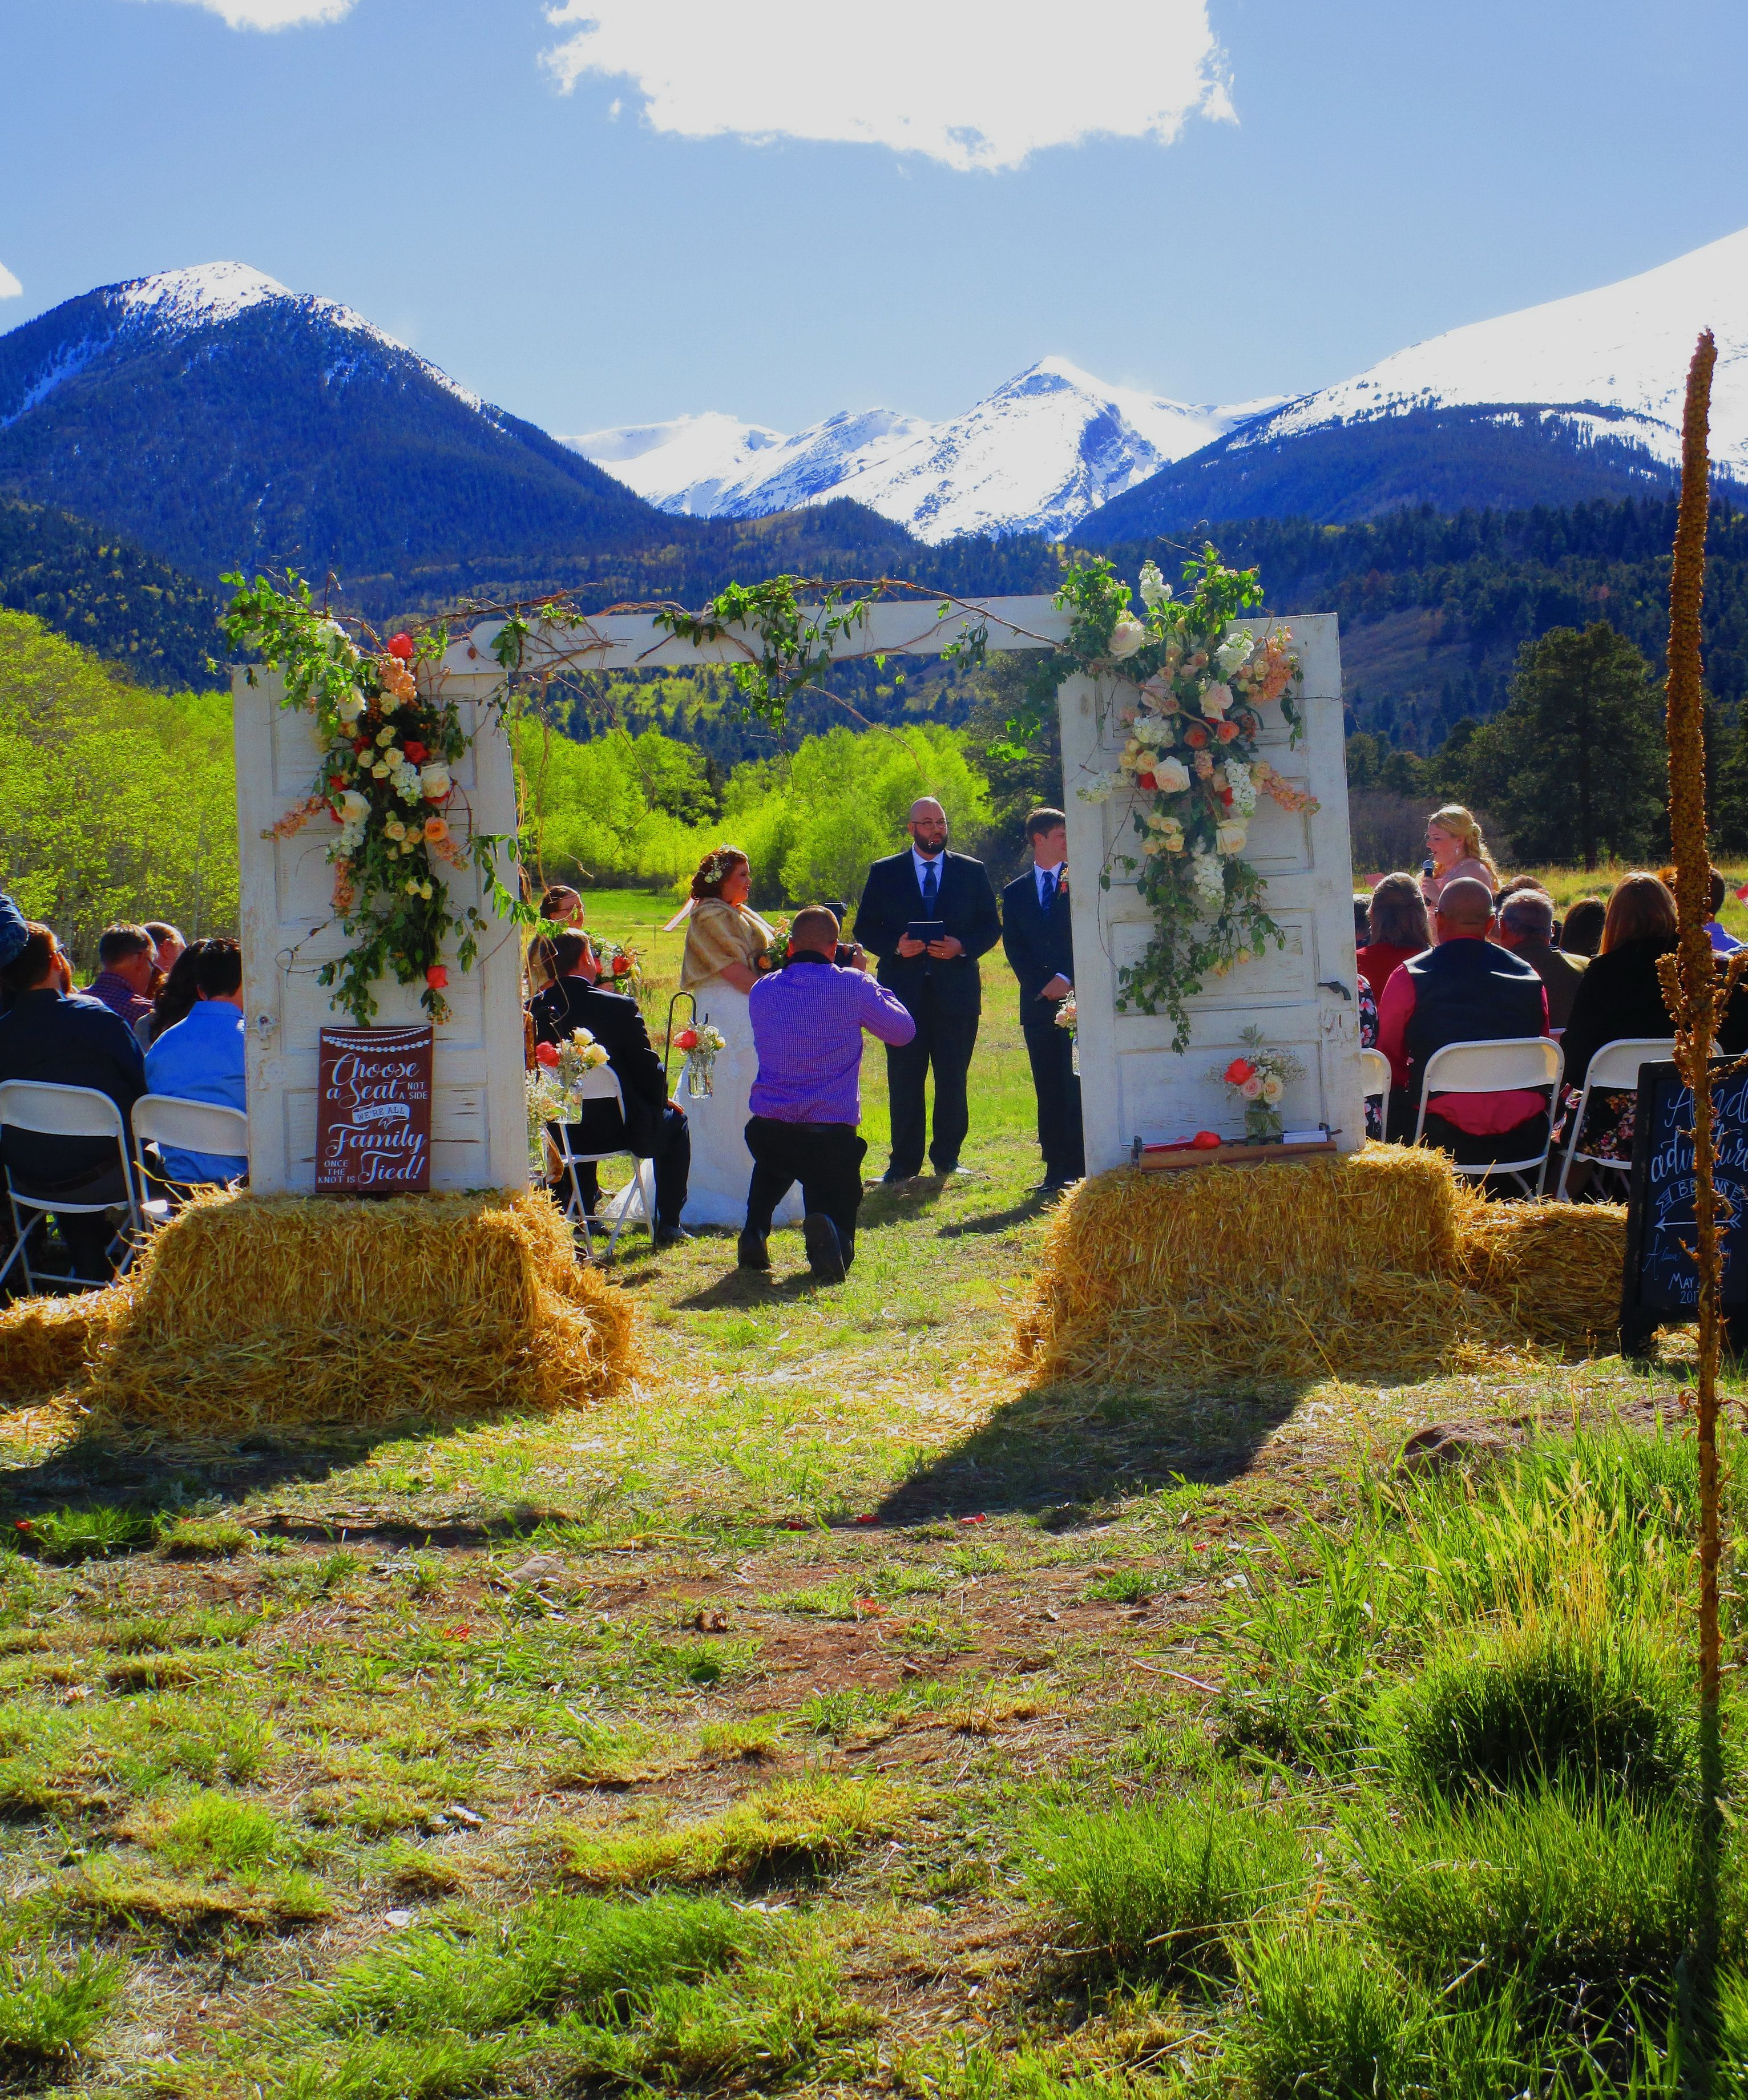 Colorado Mountain Wedding Venue the Historic Pines Ranch